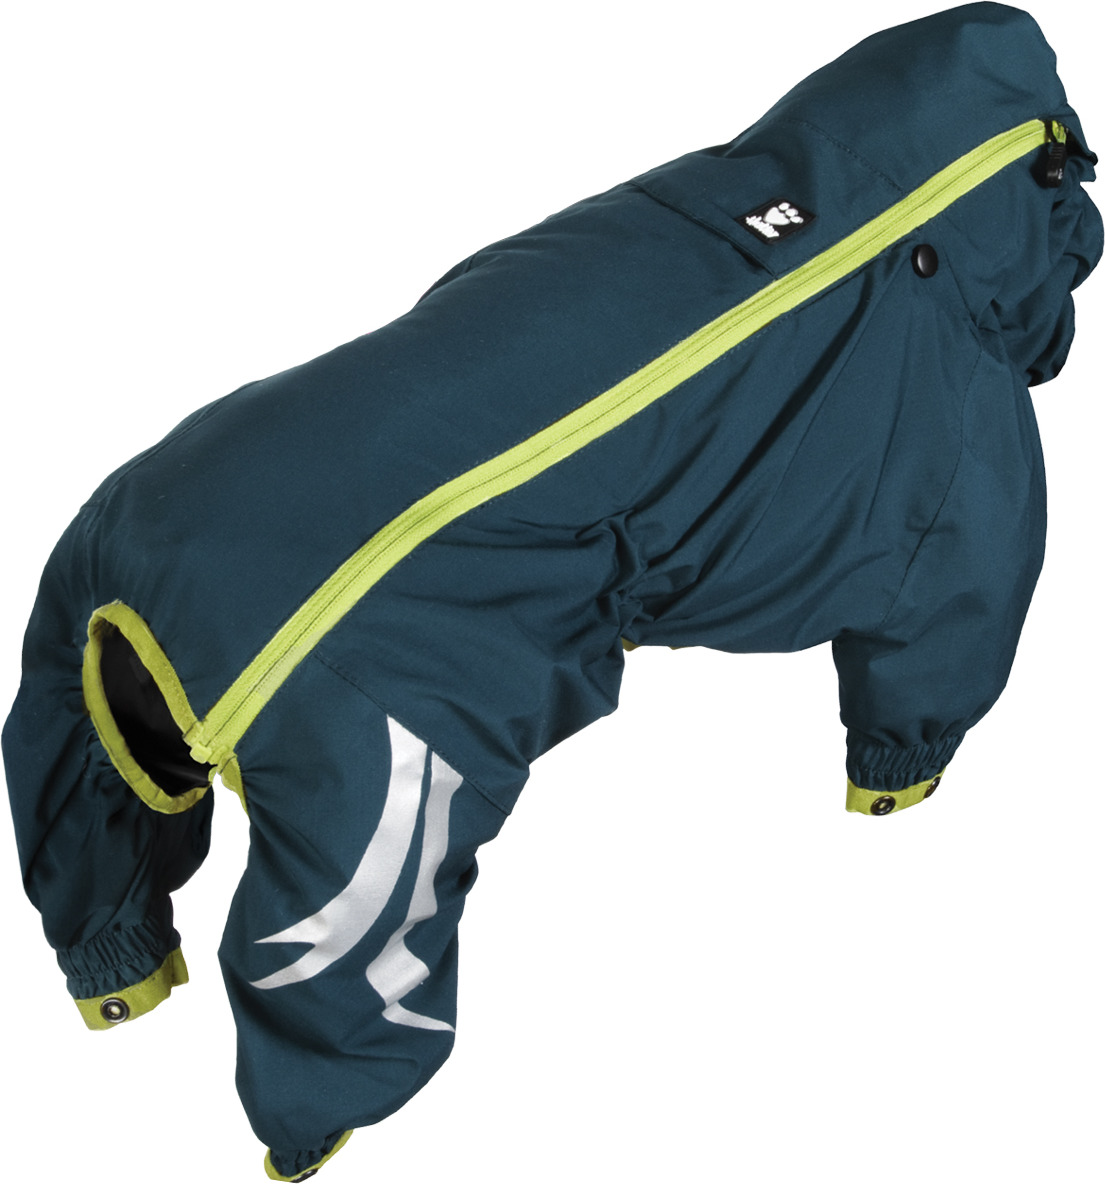 Комбинезон для собак Hurtta Slush Combat, 931377, синий, зеленый. Размер 30S